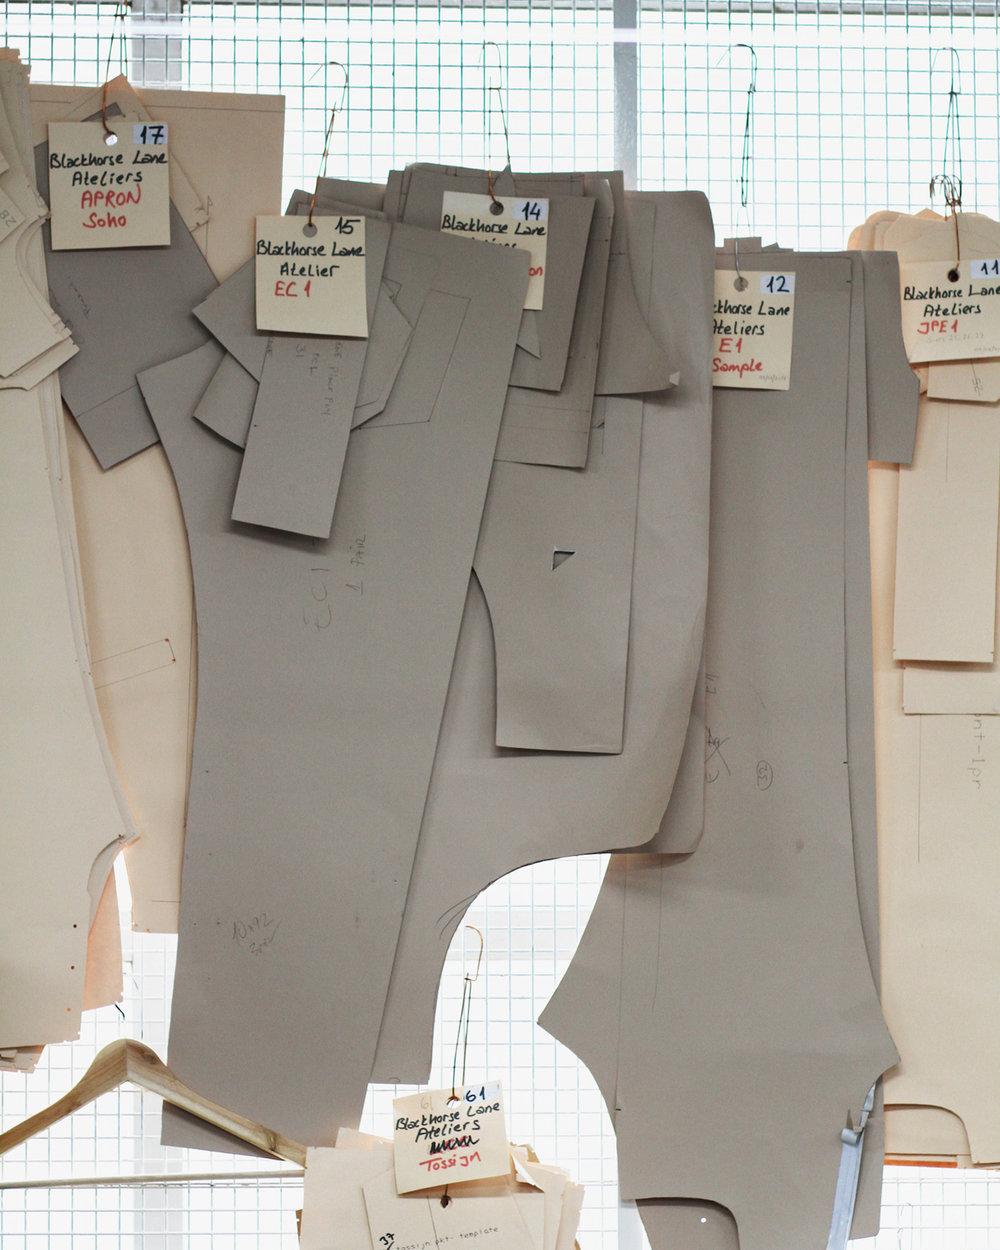 blackhorse-lane-jeans-patterns.jpg